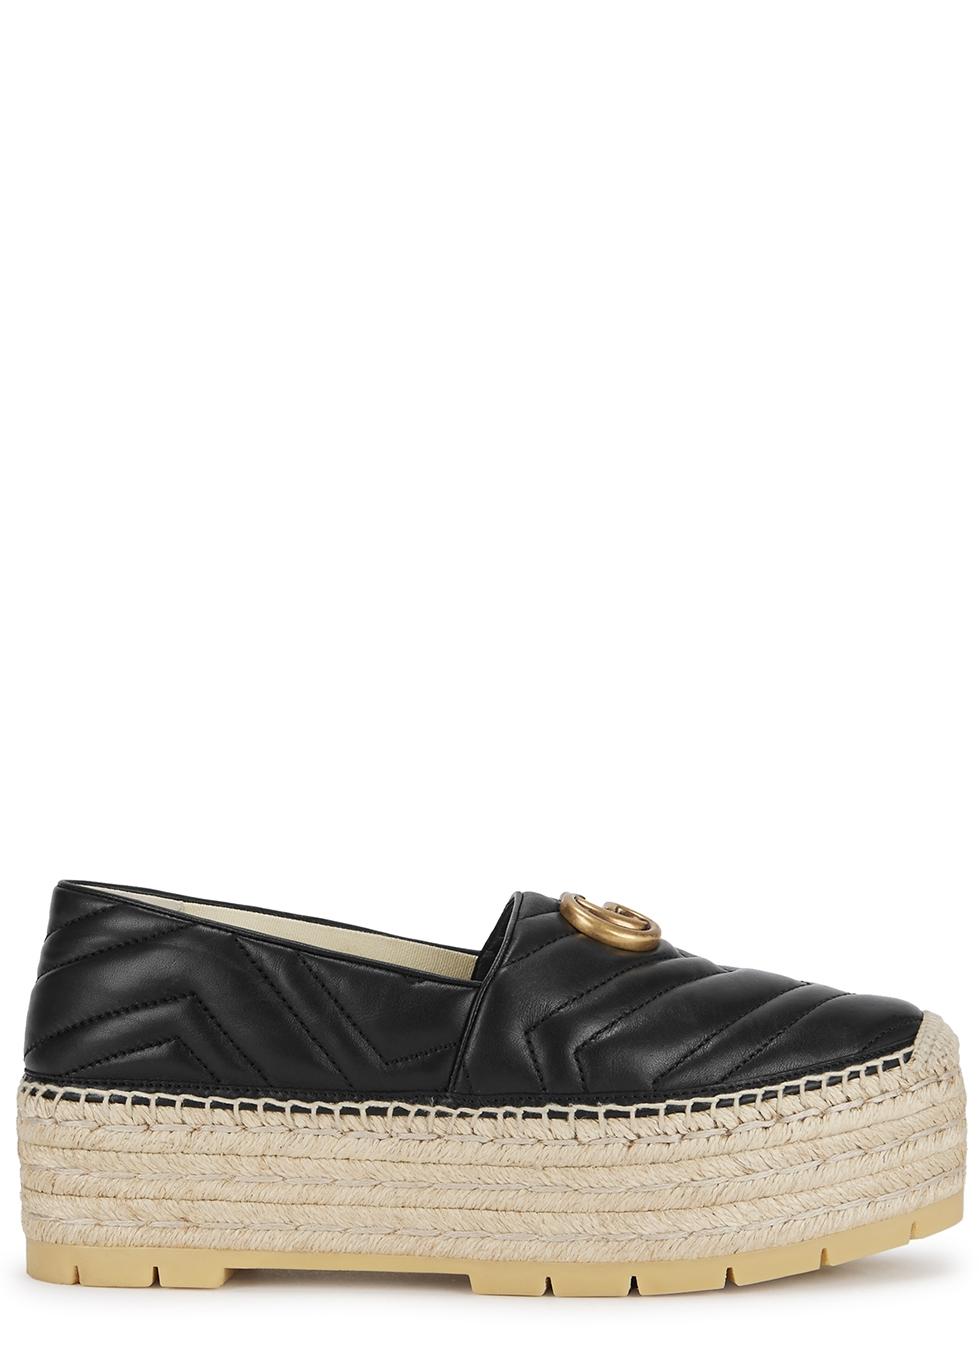 100ed898e792 Gucci GG 50 black leather espadrilles - Harvey Nichols